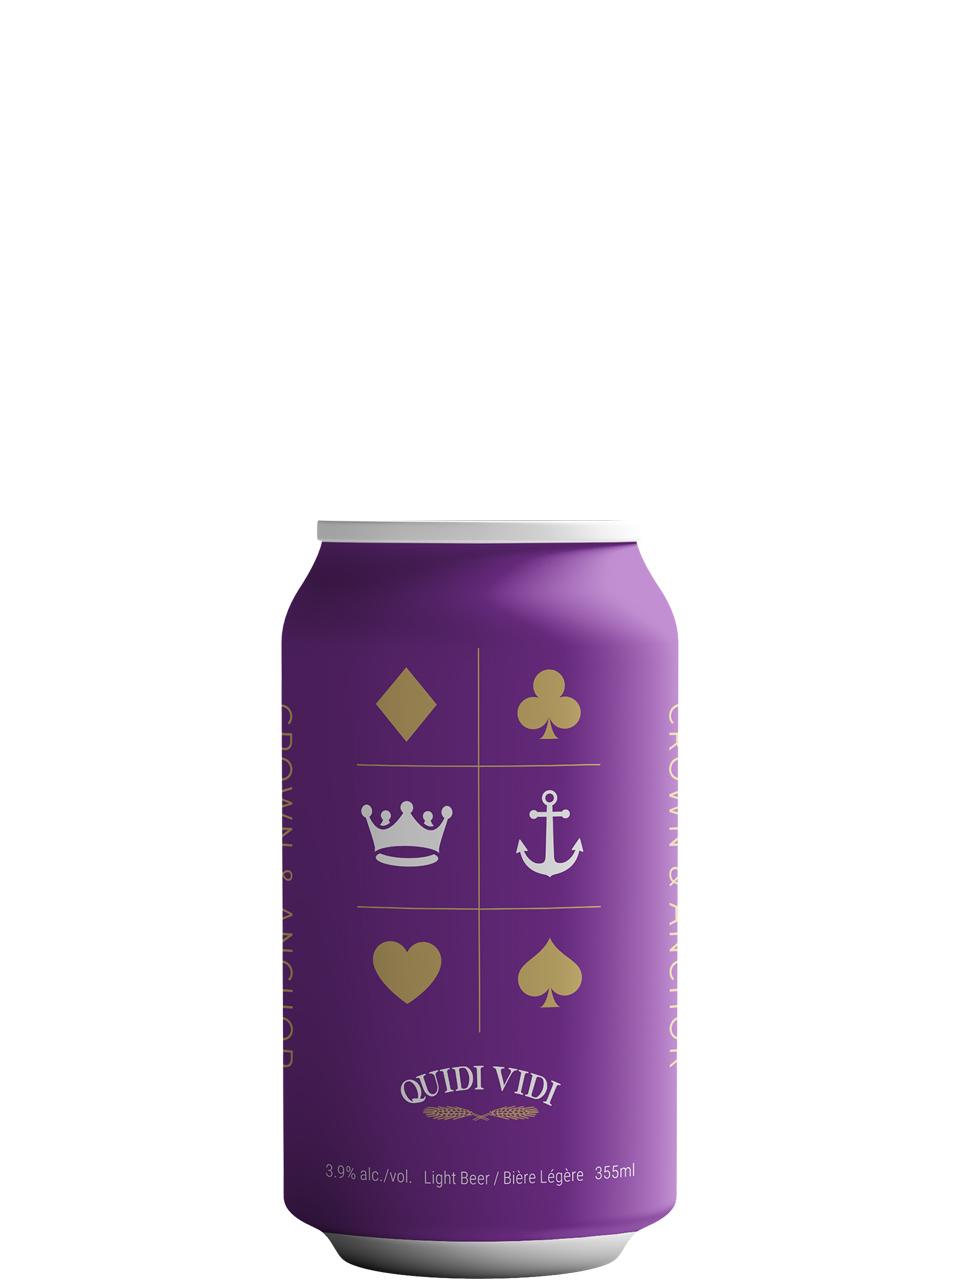 Quidi Vidi Crown & Anchor Light Lager 8pk Cans